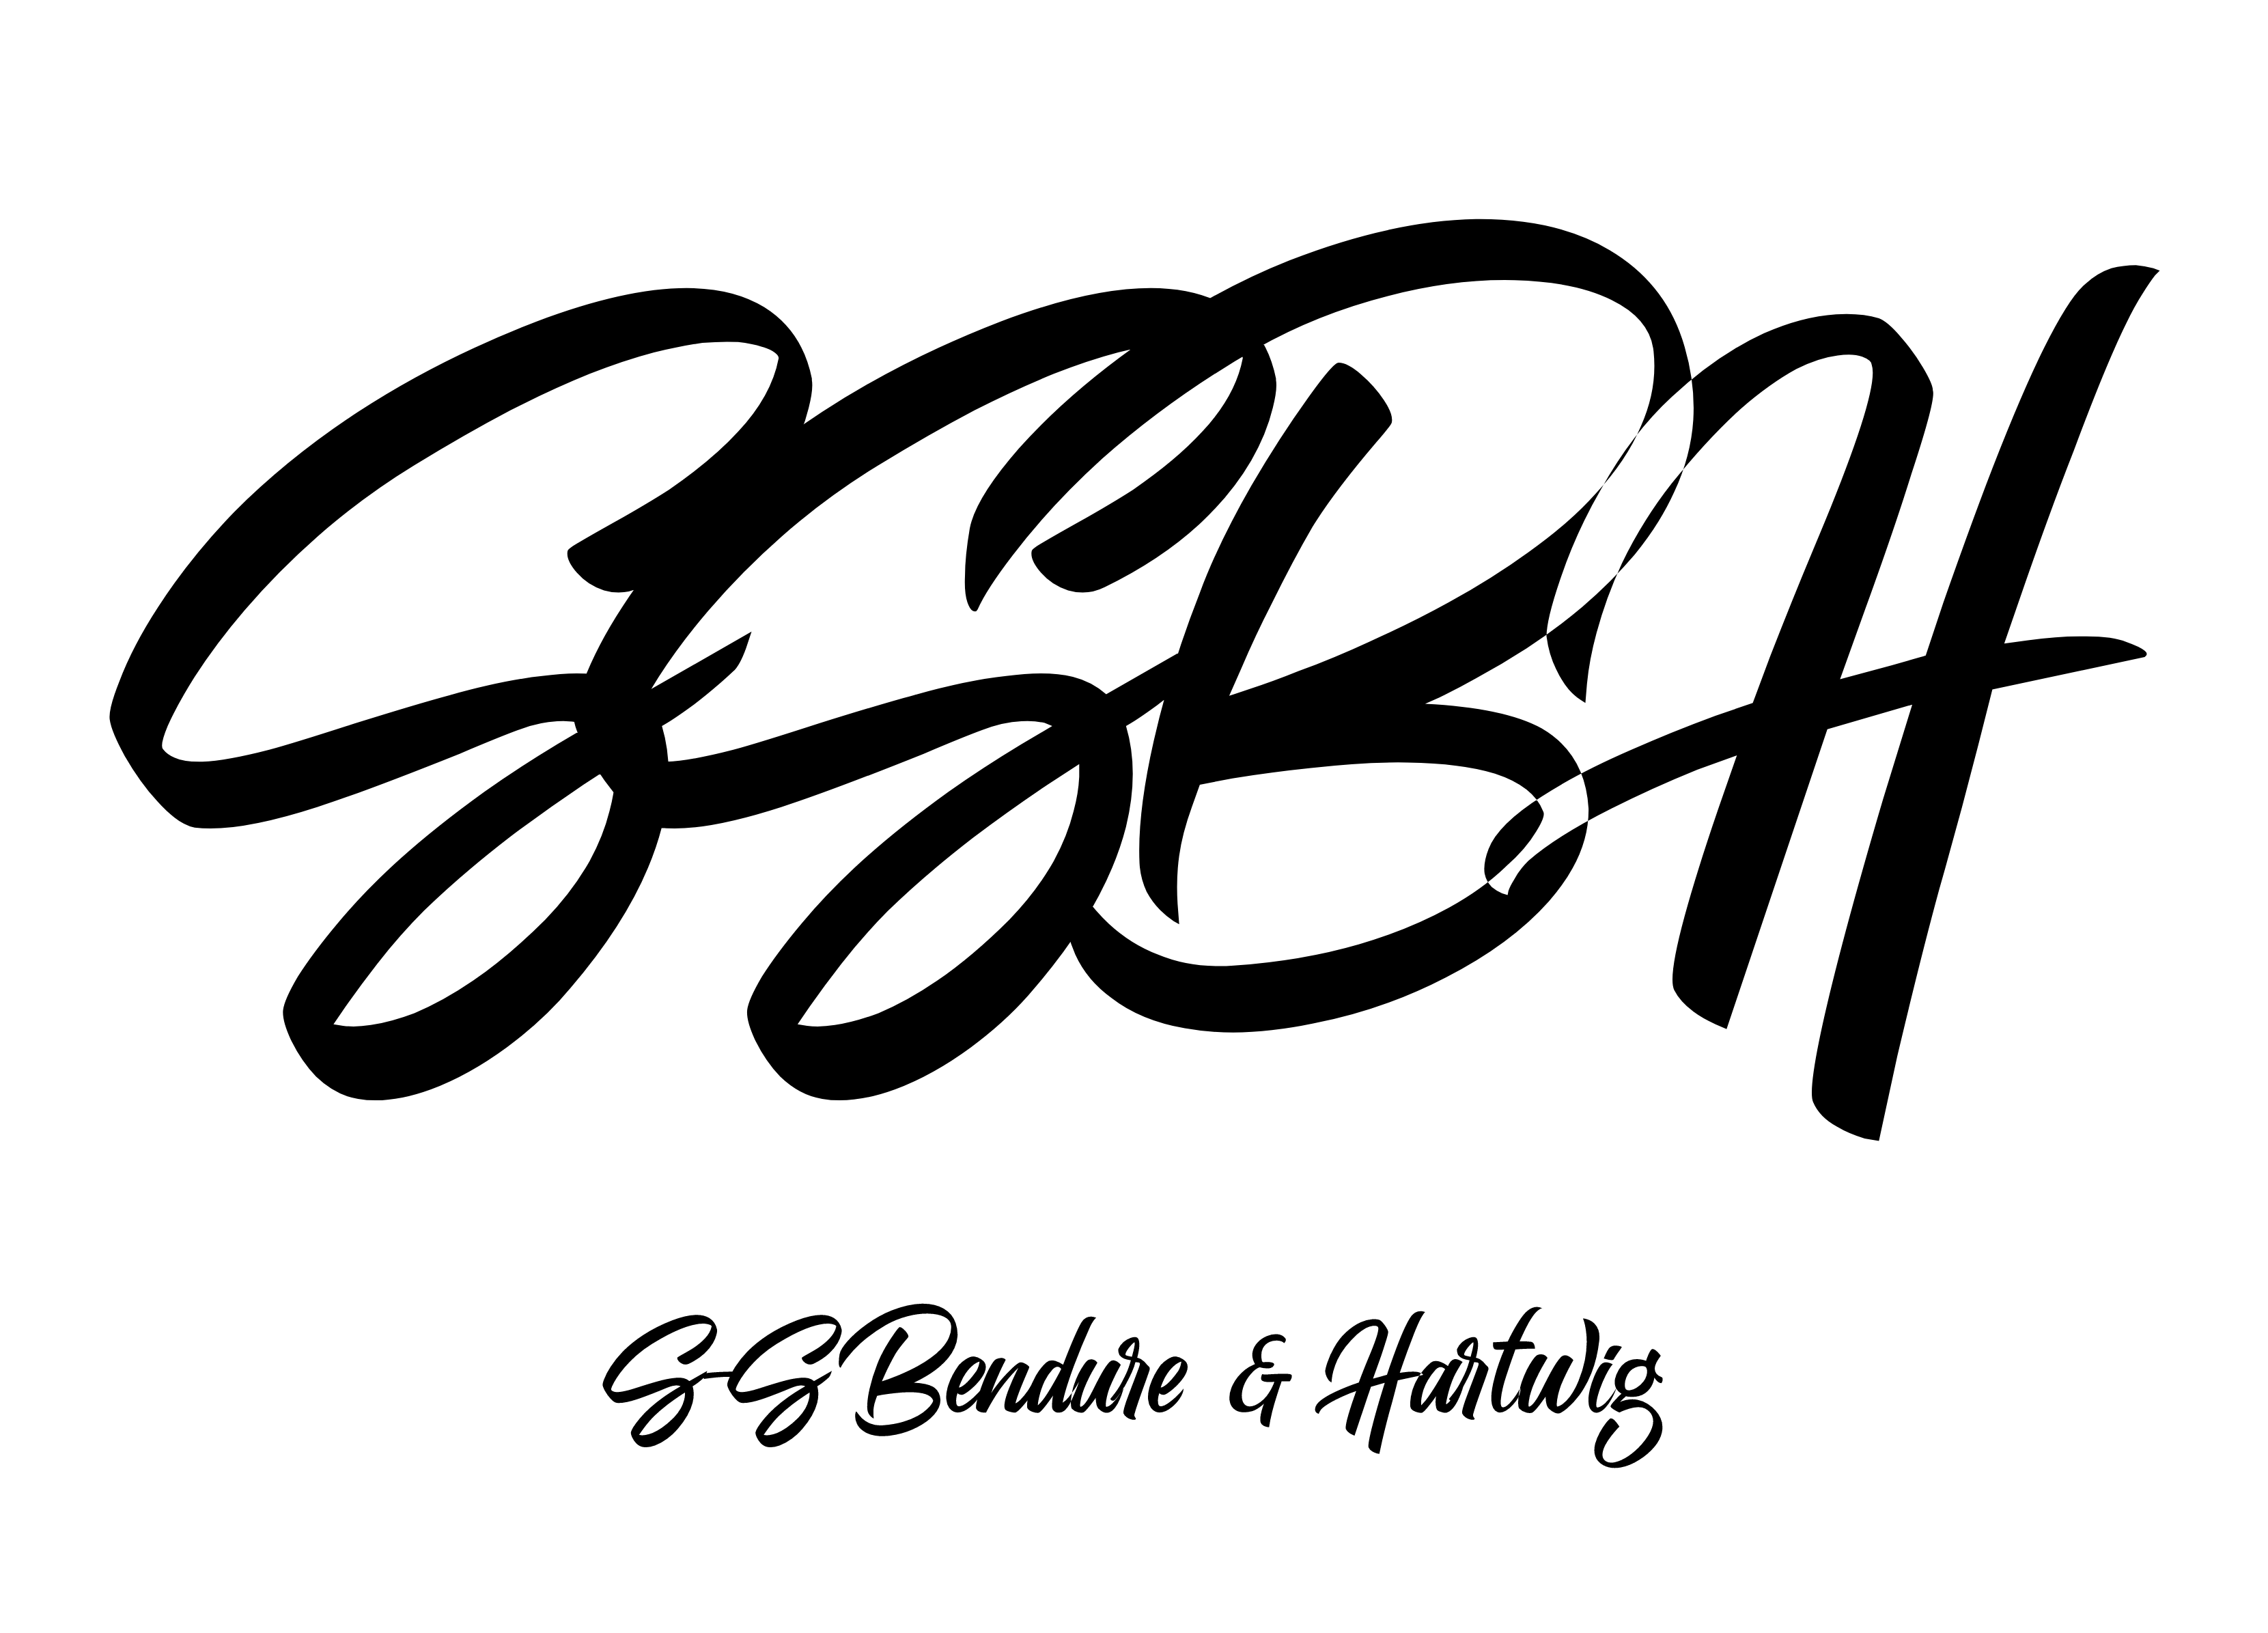 SS Bendure - Hartwig logo